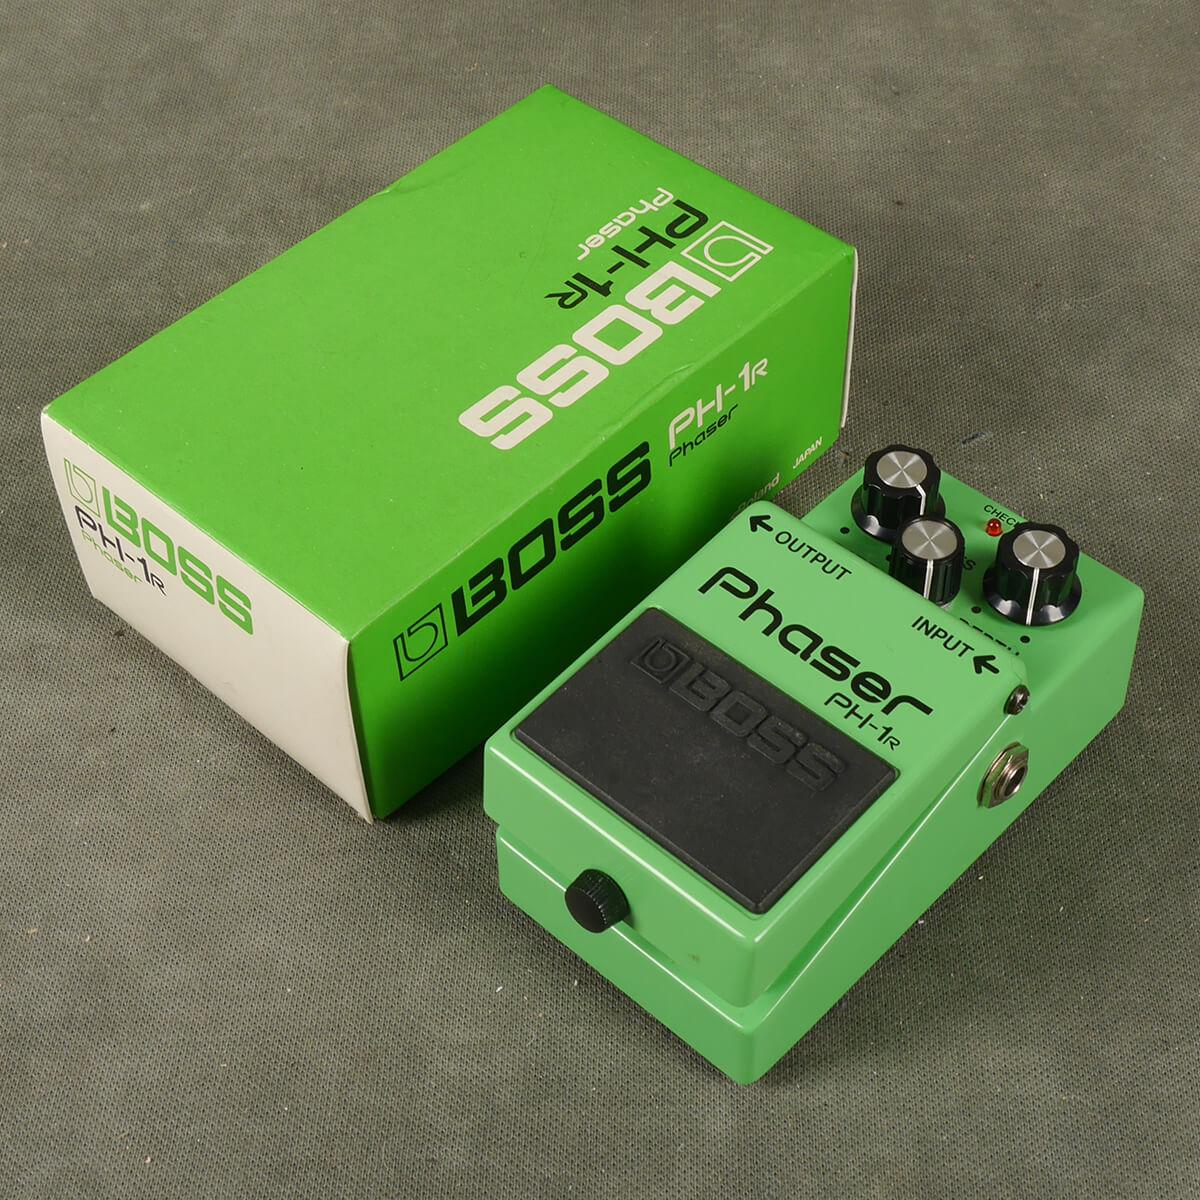 Boss PH-1R Phaser FX Pedal w/Box - 2nd Hand